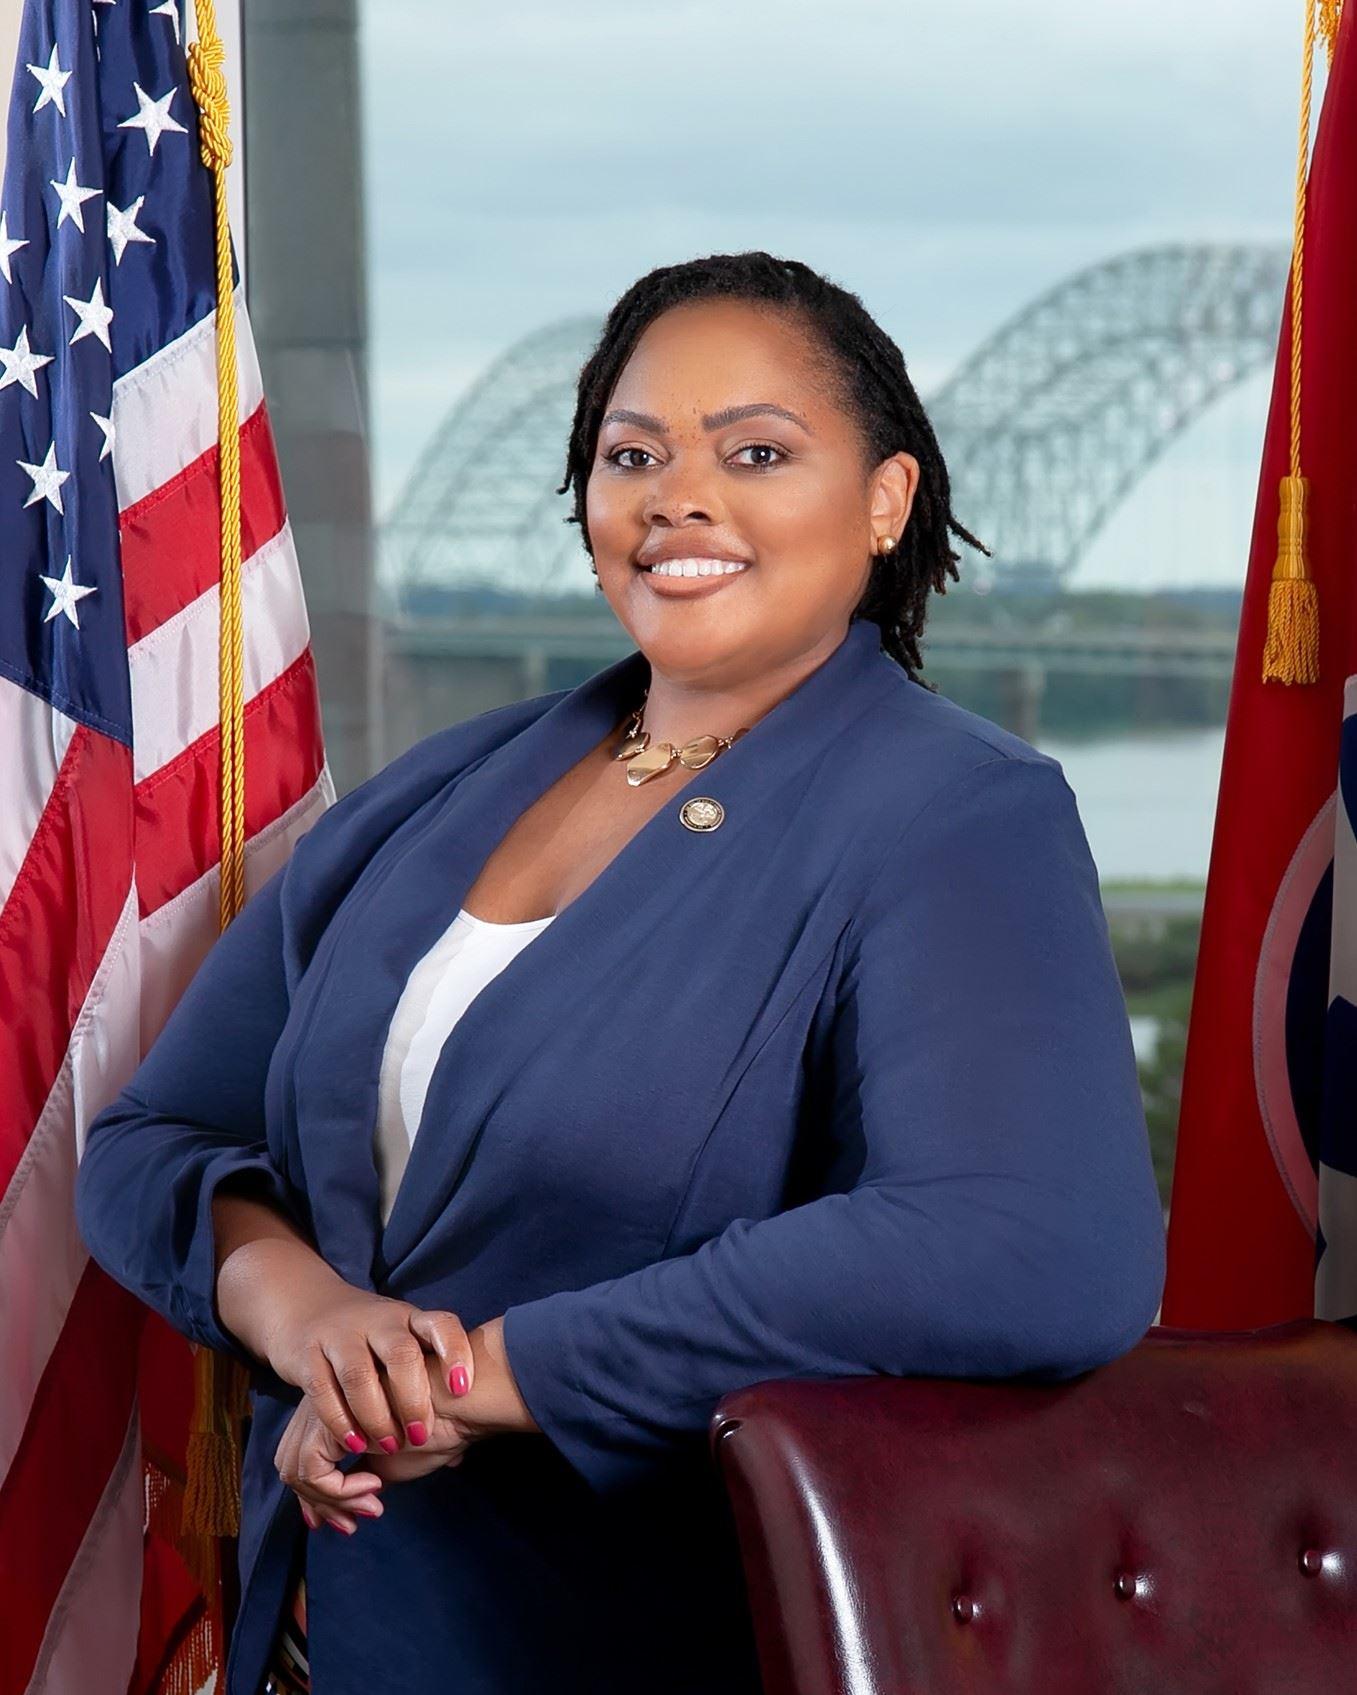 Help a Black woman leader facing death threats